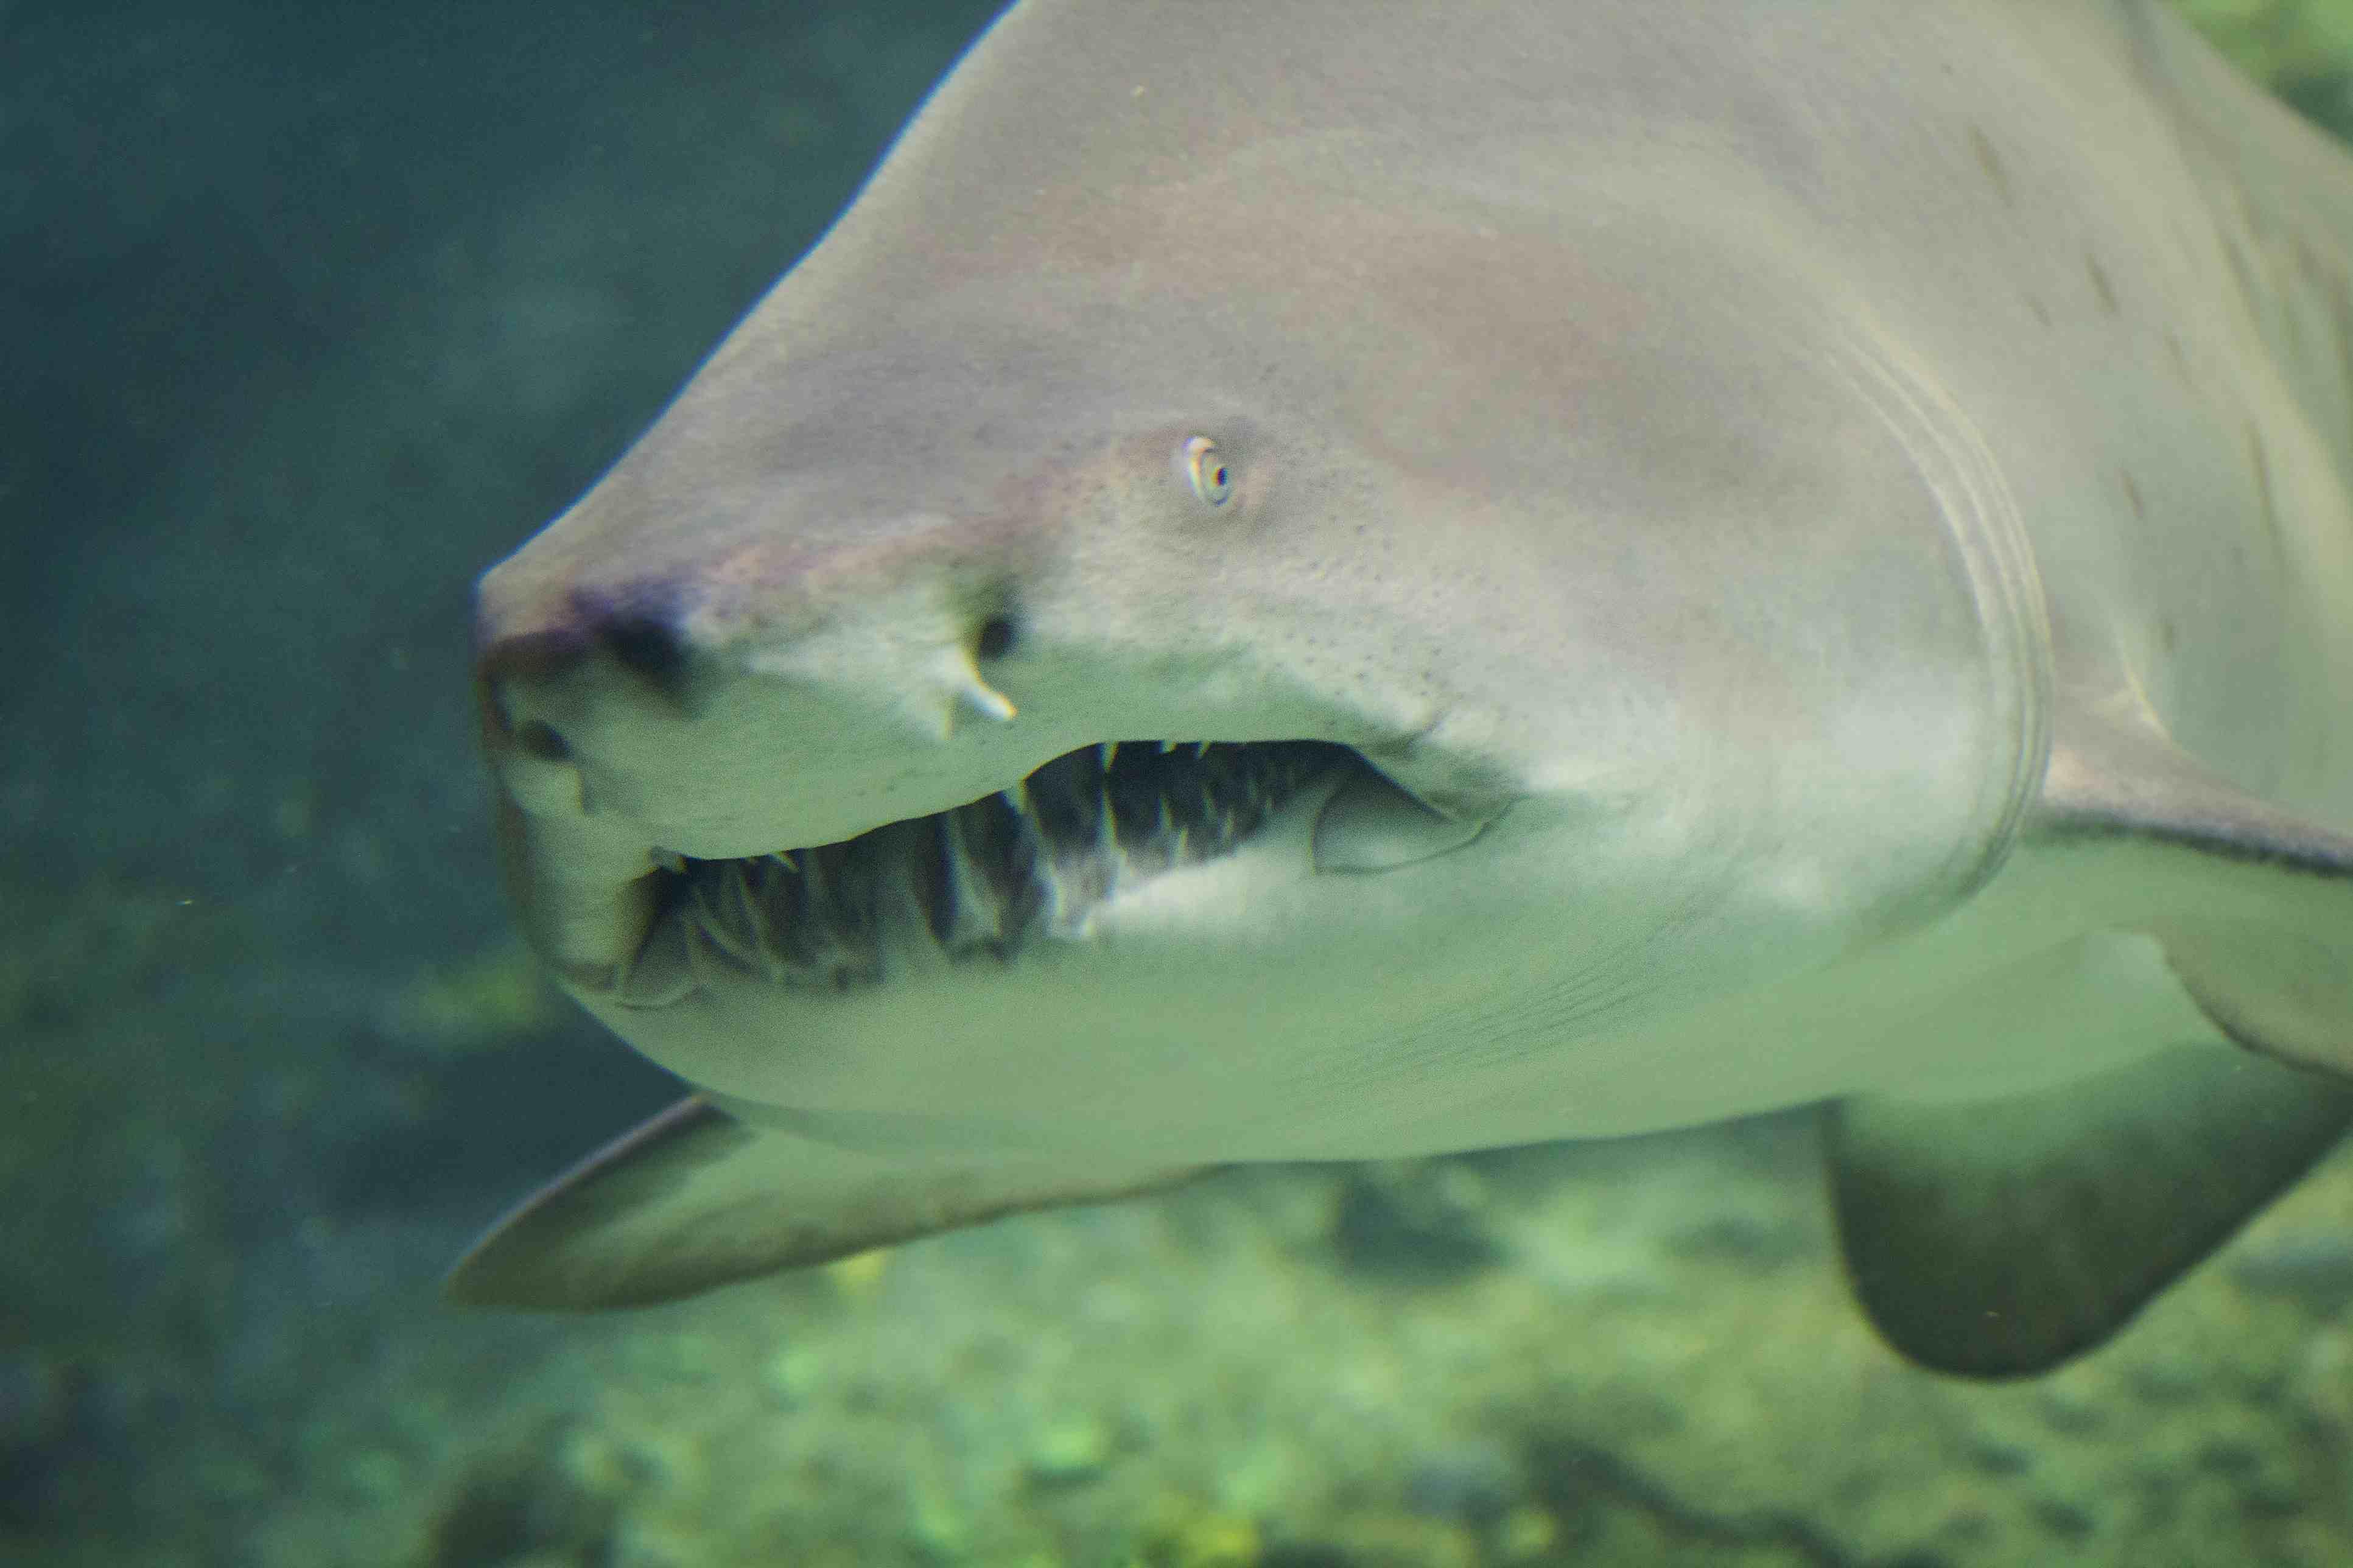 Shark at aquarium in North Carolina